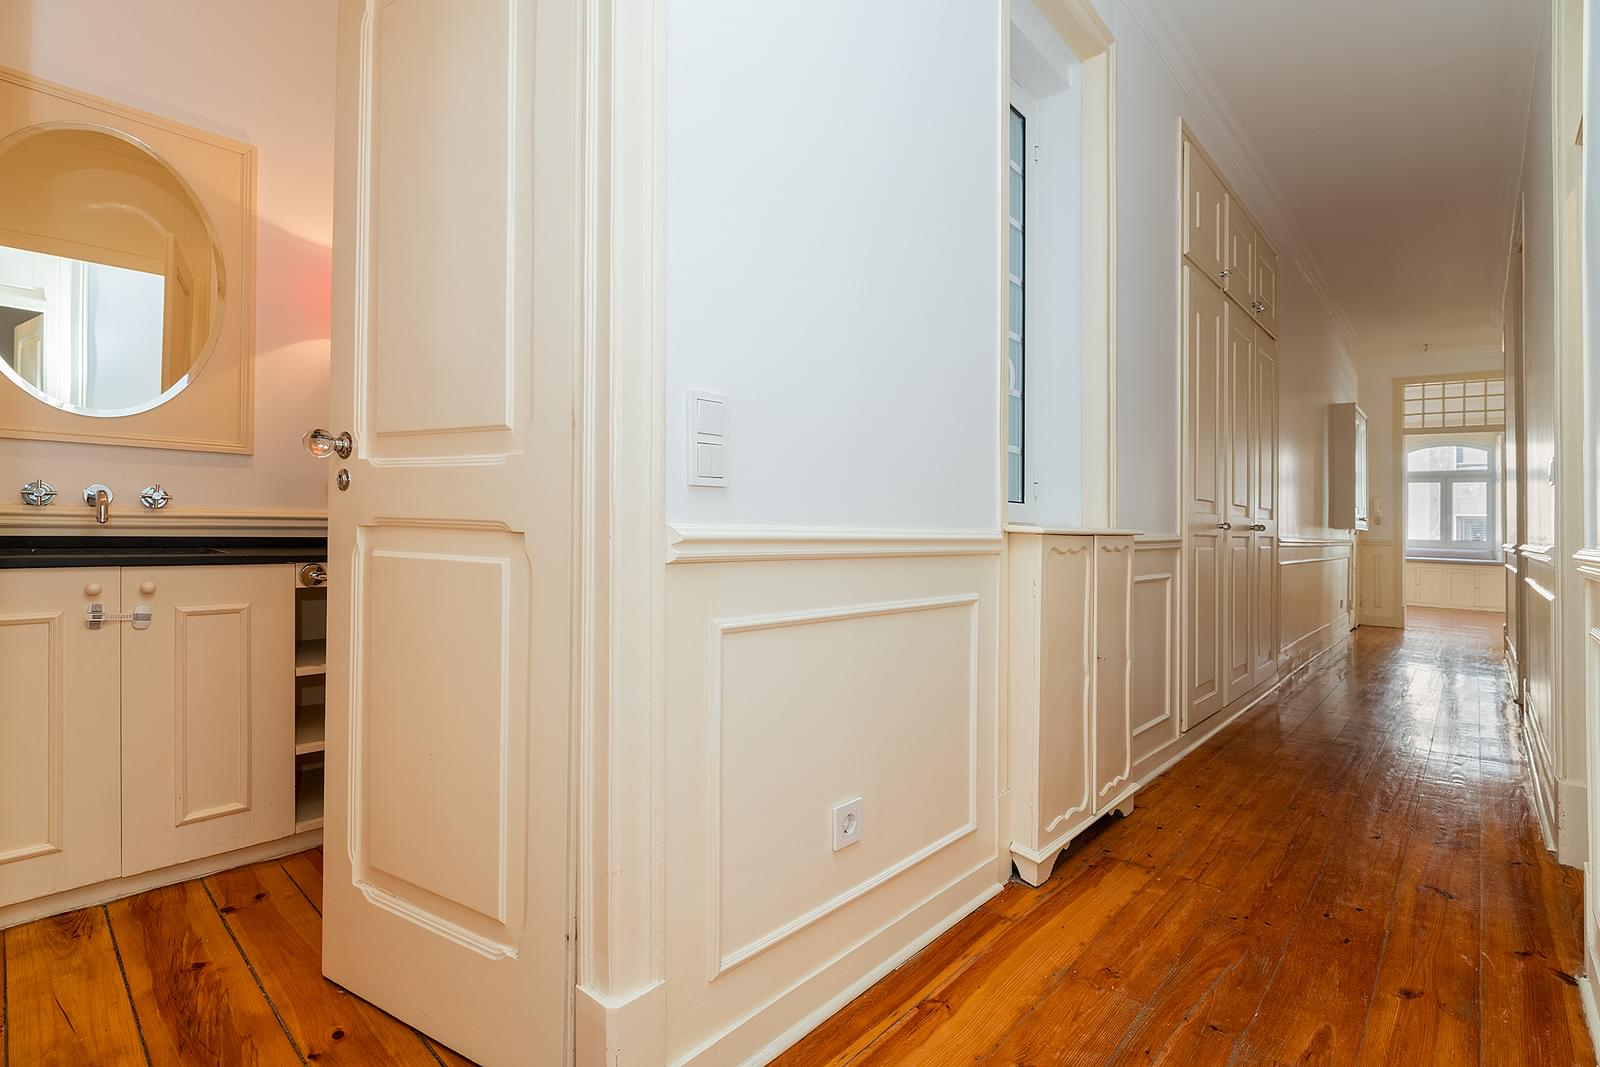 pf18723-apartamento-t3-1-lisboa-c9f850d5-2c60-460d-8e61-da7f633d6fa6